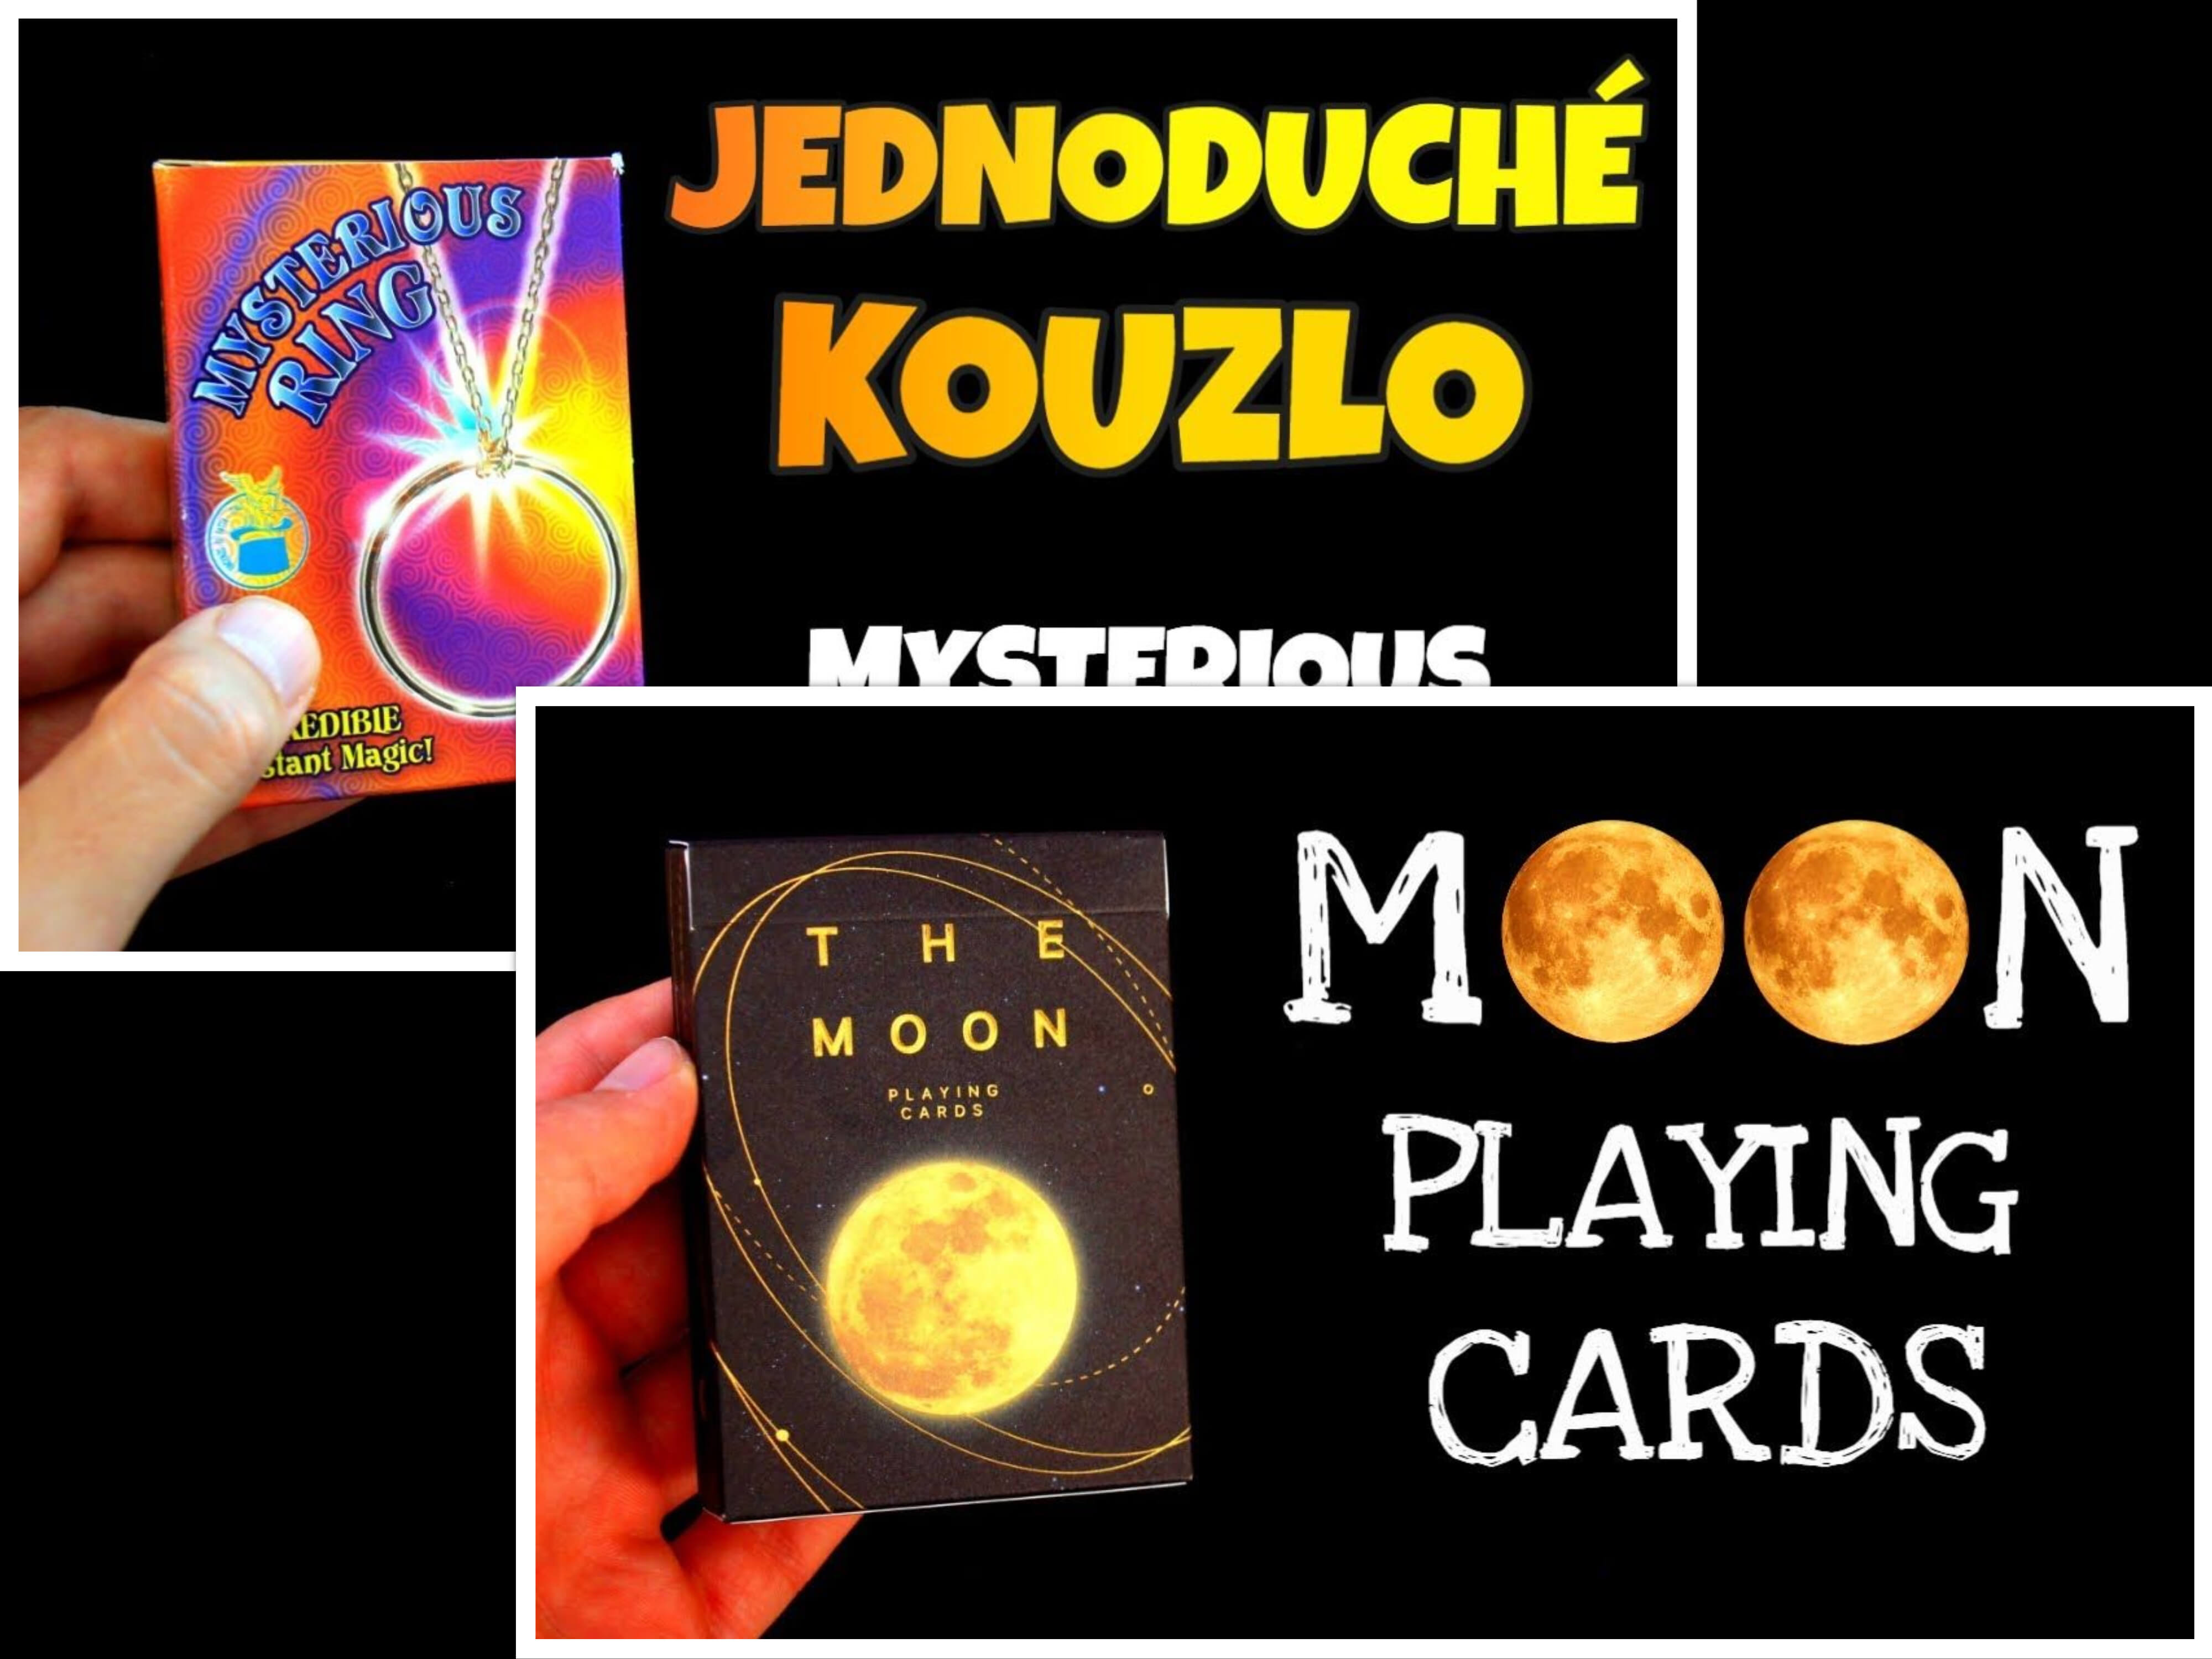 RECENZE: Karty MOON + Kouzlo Mysterious Ring